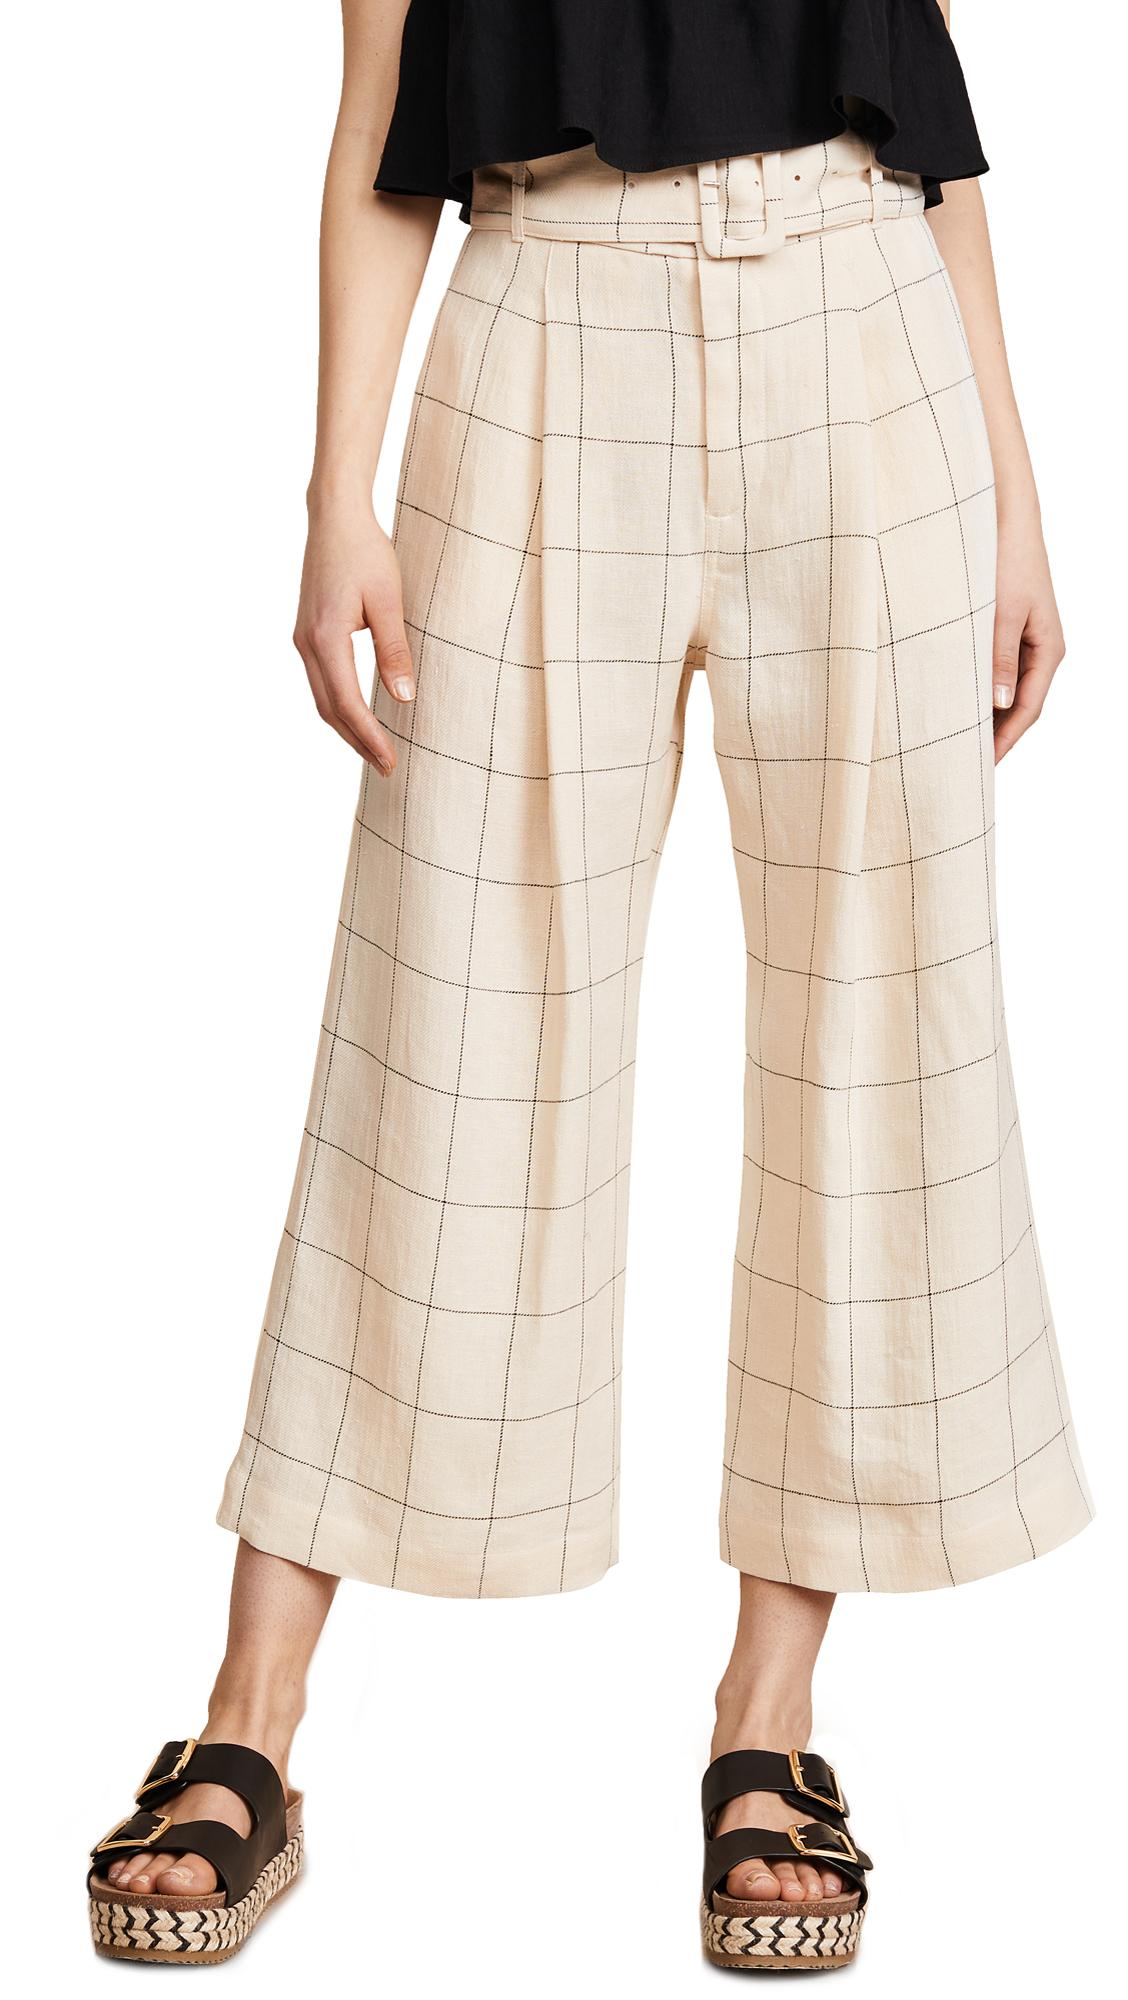 Hadley Pants in White